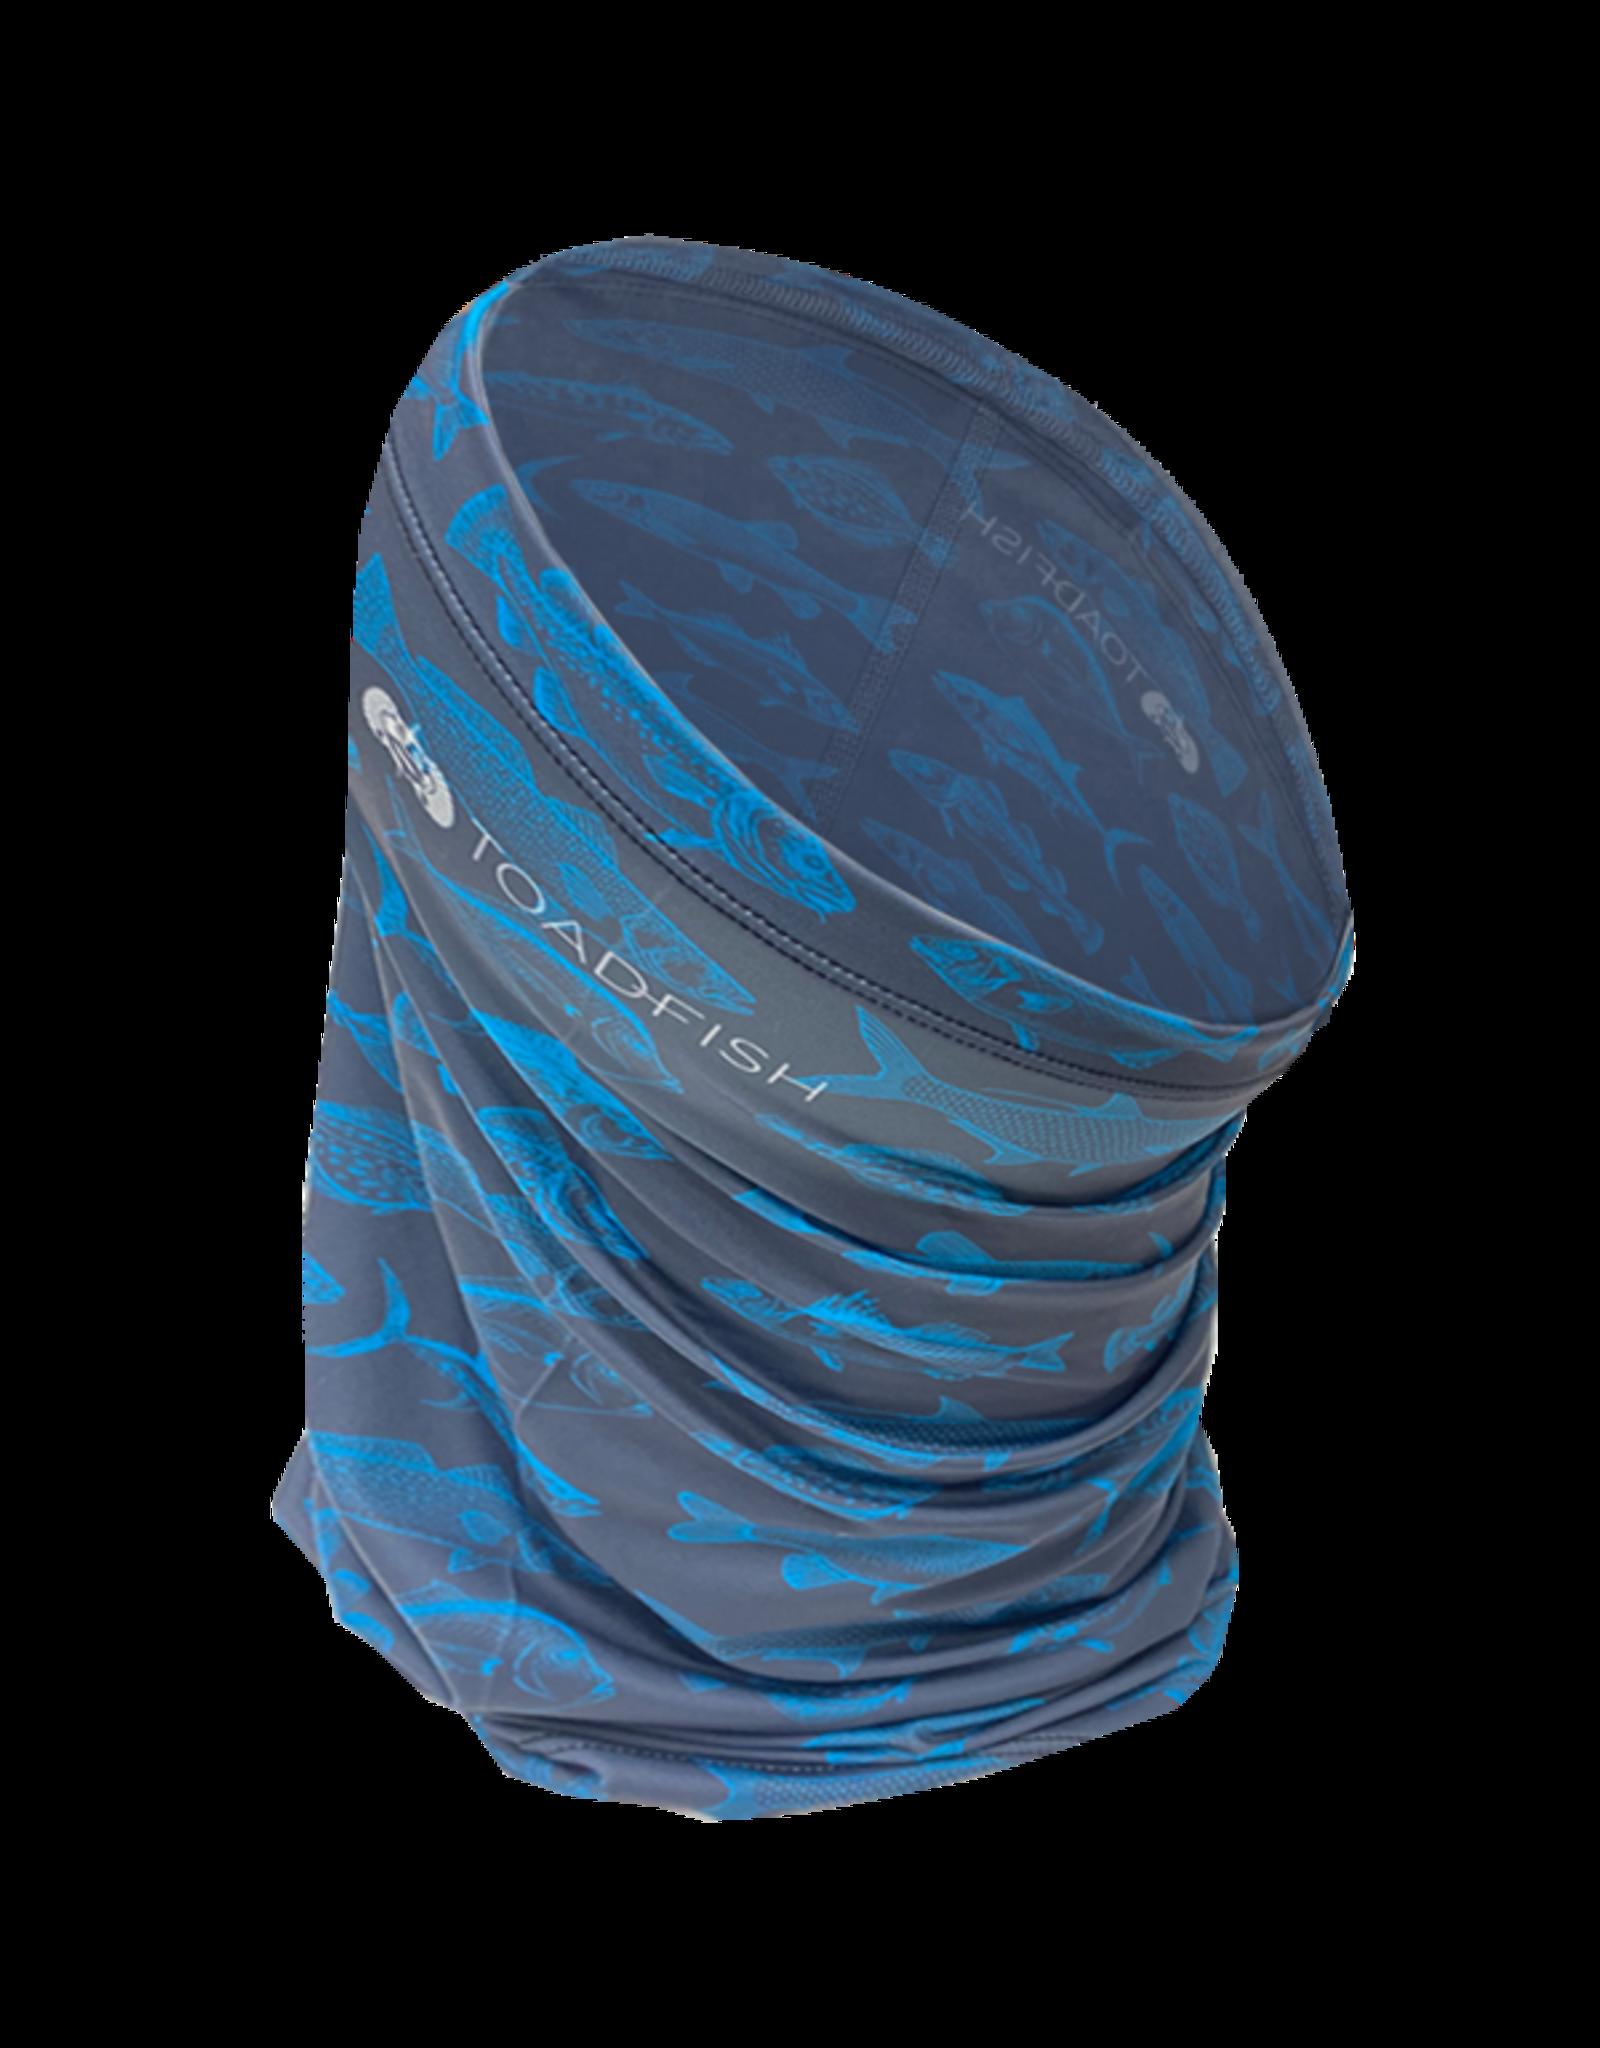 Toadfish UV Gaiter - Gray w/Fish Pattern